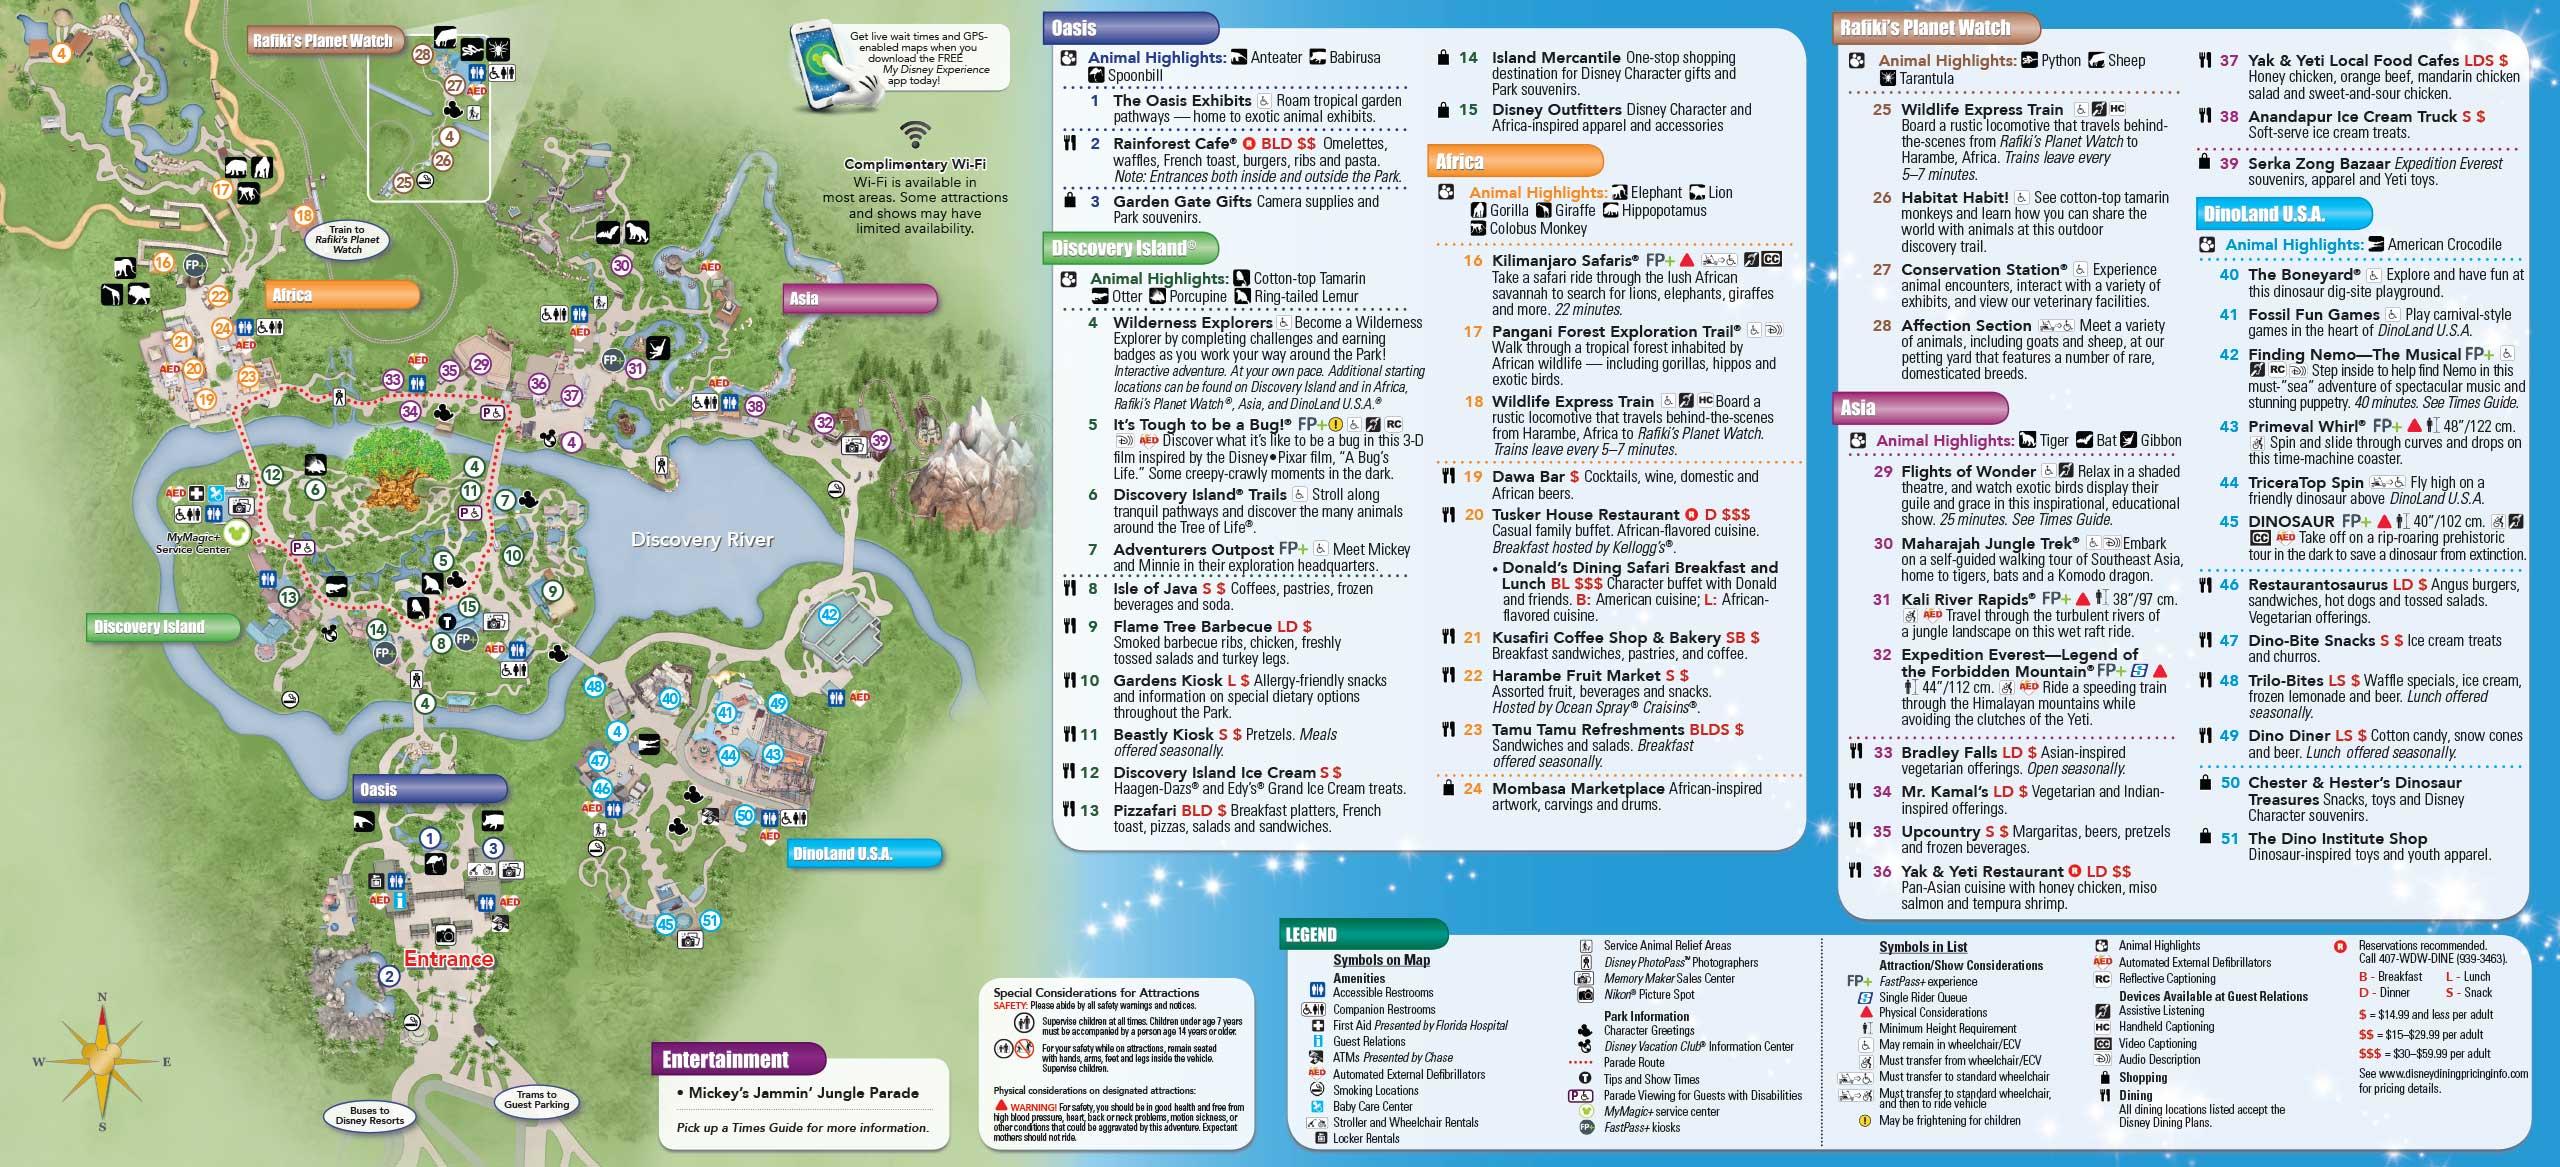 2014 walt disney world park maps with fastpass photo 8 of 8